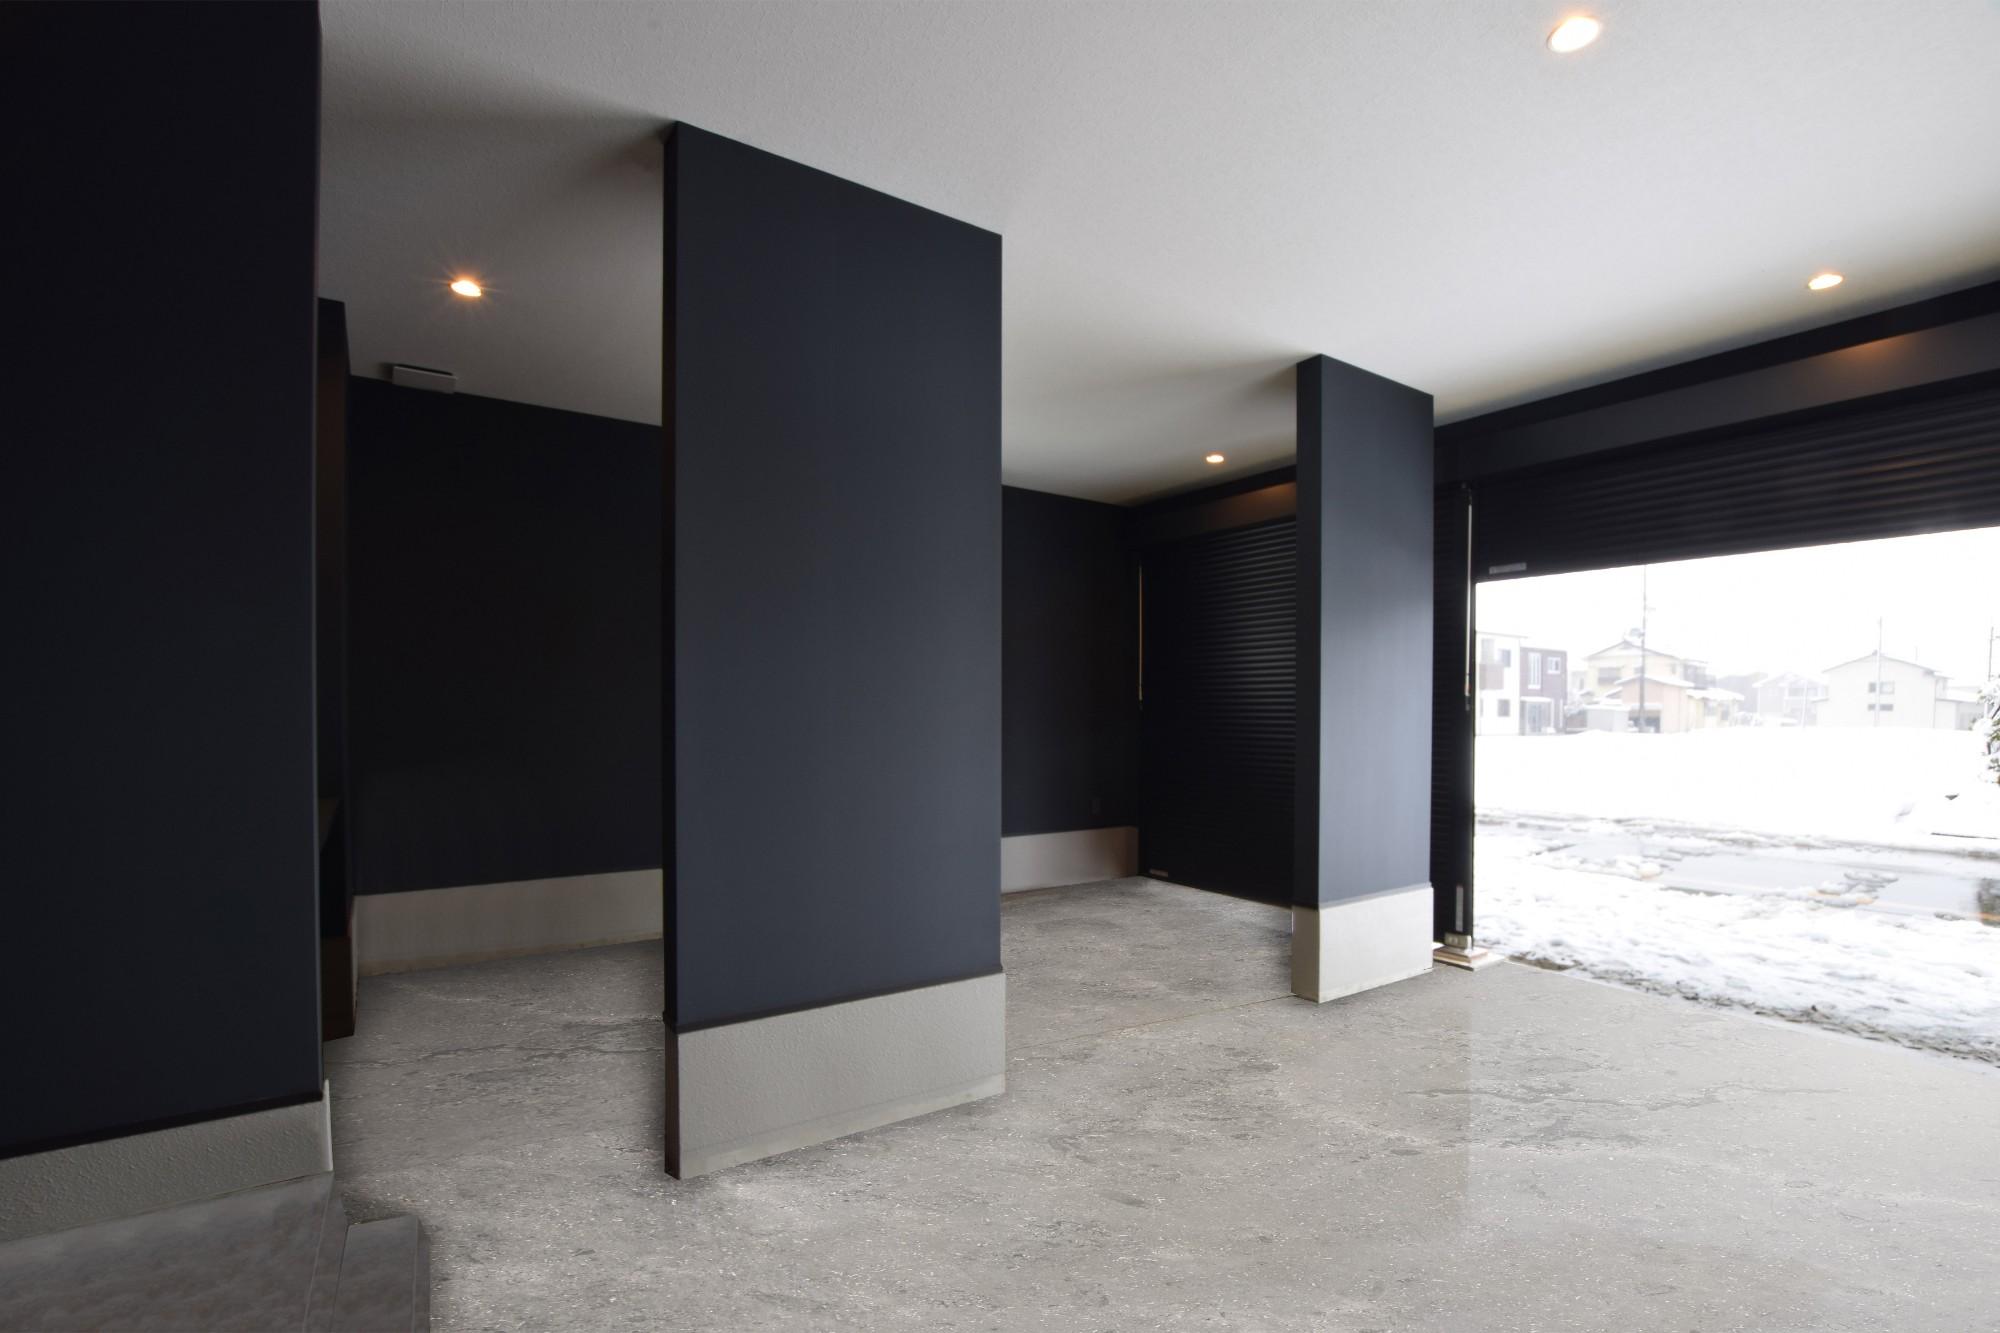 DETAIL HOME(ディテールホーム)「趣味と風景をたのしむ家」のヴィンテージなガレージの実例写真